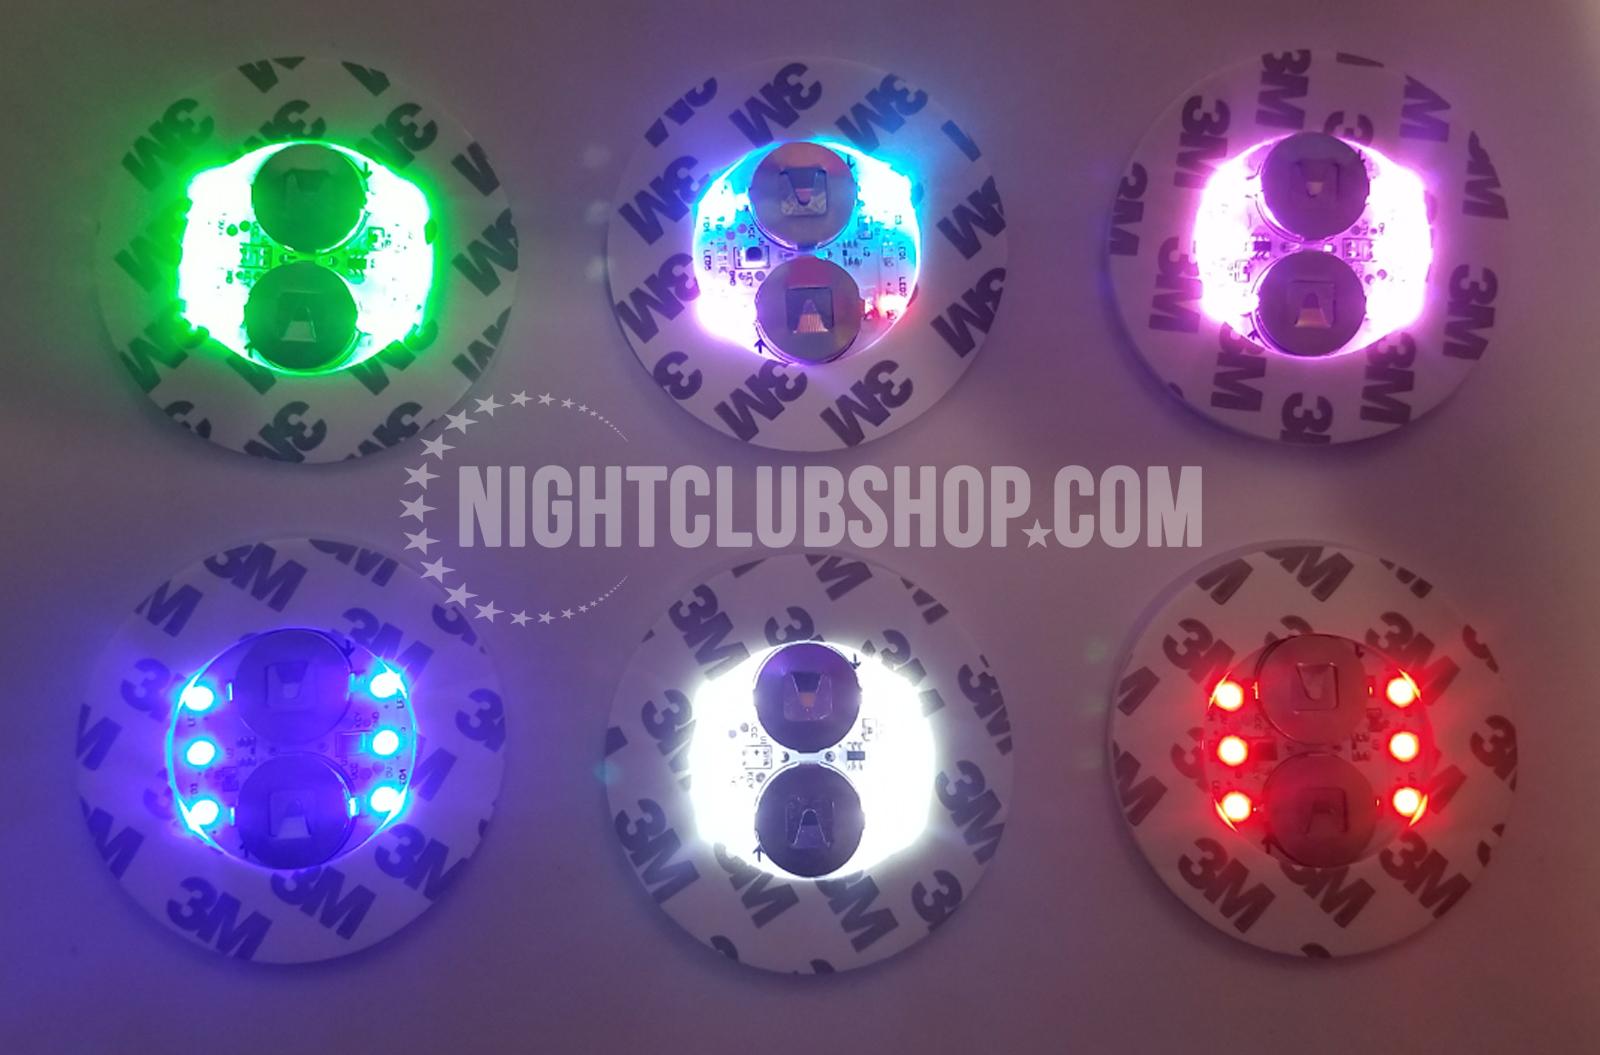 led-stick-on-bottle-glorifier-coaster-sticker-mini-bottle-glow-color-multi-color-ledcoaster-nightclubshop.jpg